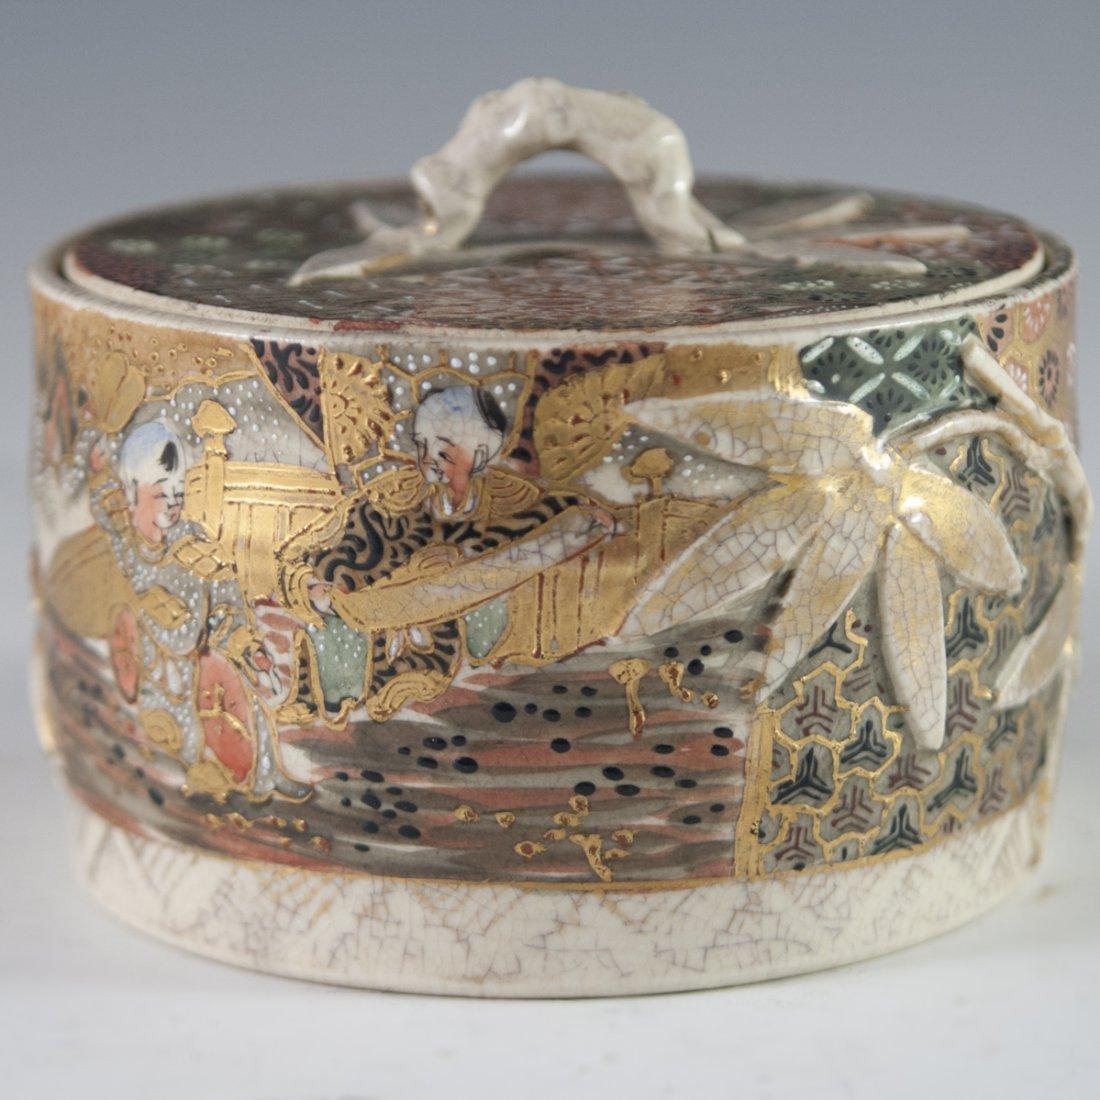 Antique Japanese Satsuma Porcelain Box